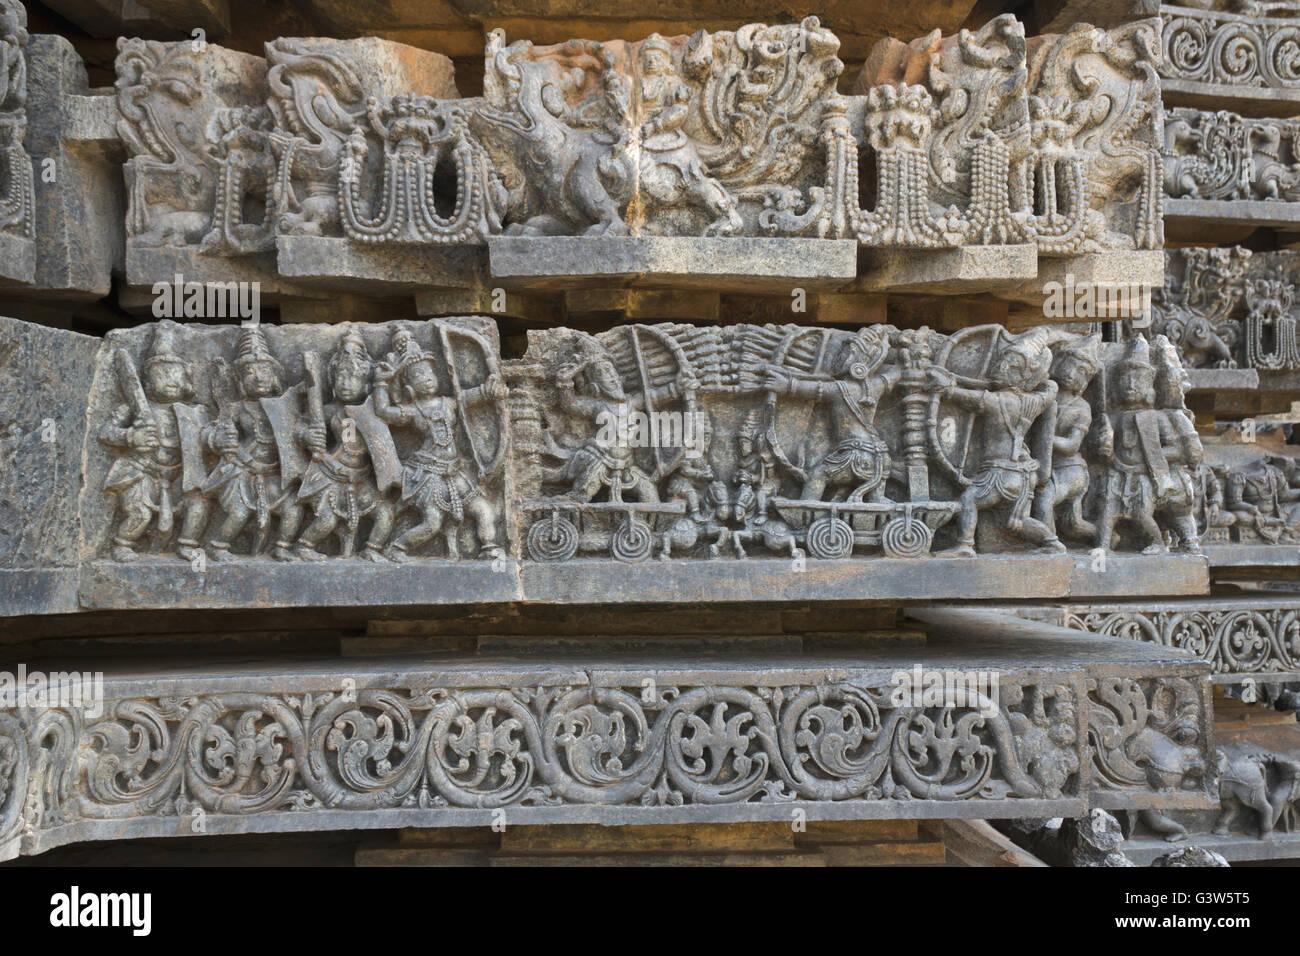 Depiction of Arjuna-Bhishma war from Mahabharata, at the base of temple, Hoysaleshwara temple, Halebidu, Karnataka, - Stock Image